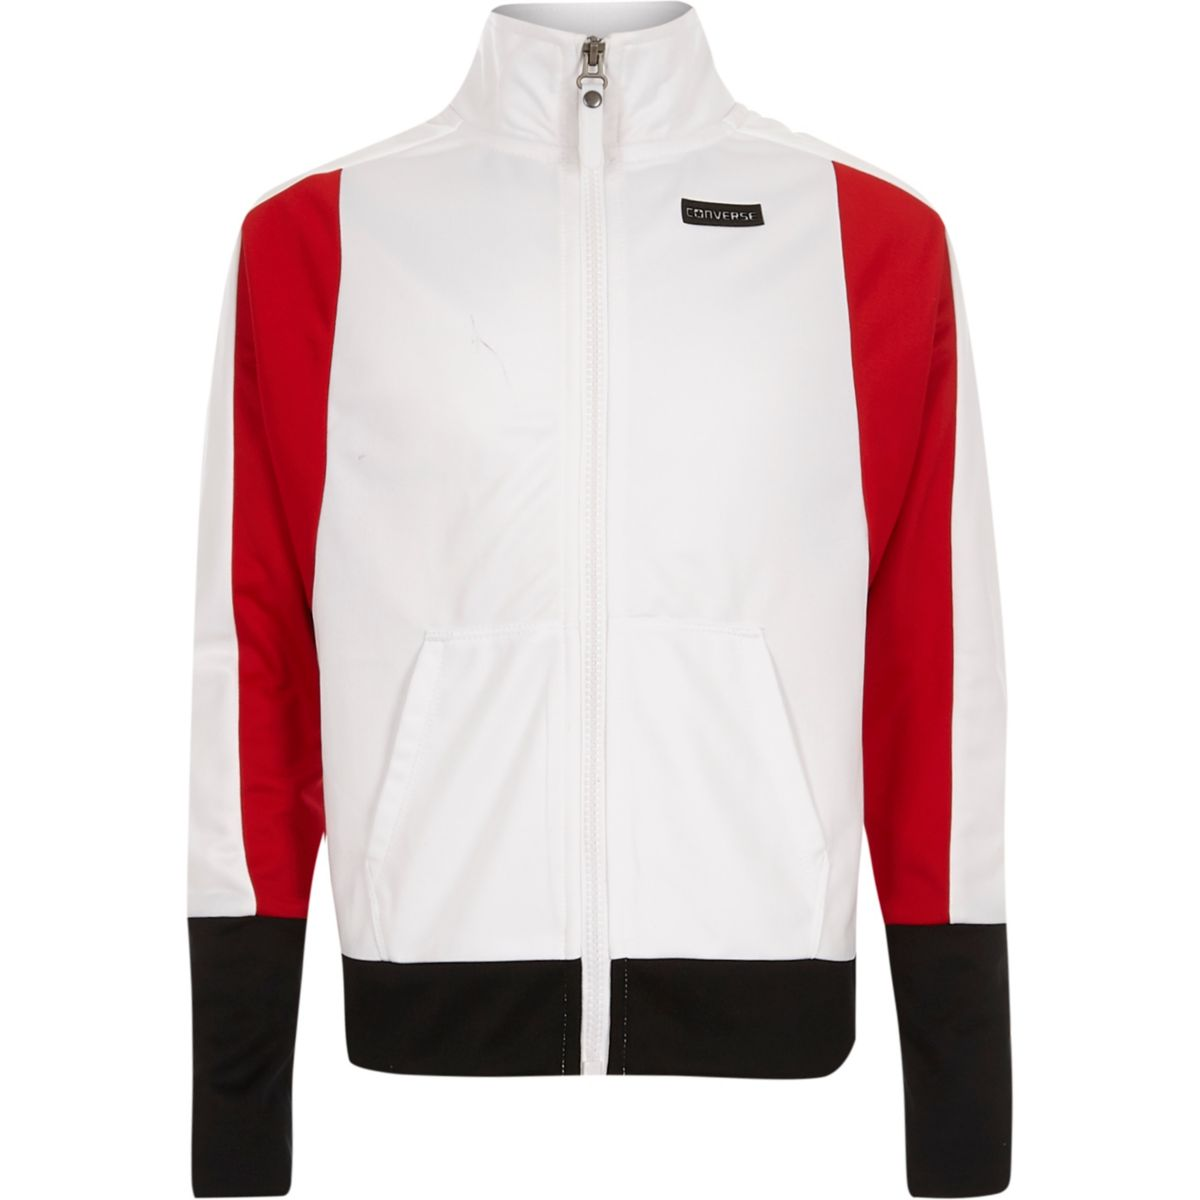 Girls white Converse zip up jacket